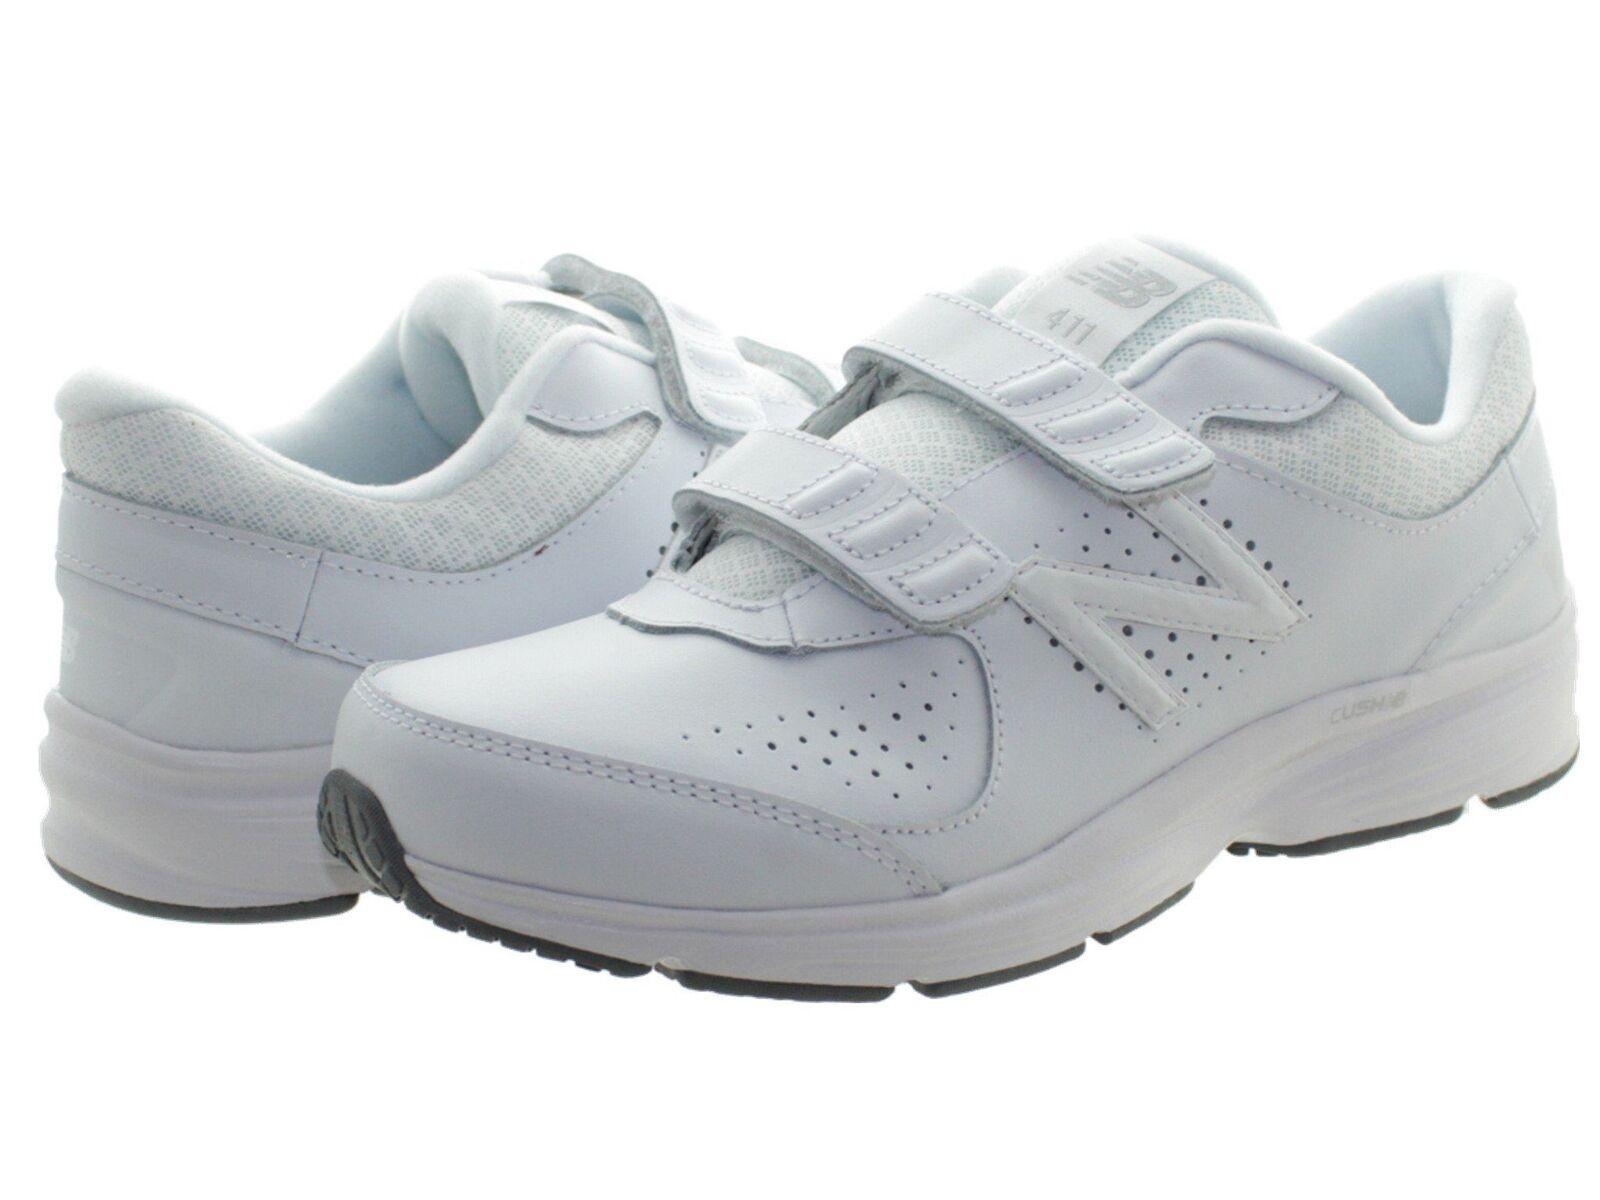 Ww411hw2 Walking Femme Chaussures Blanc New Velcr Balance 8qxwOOg5